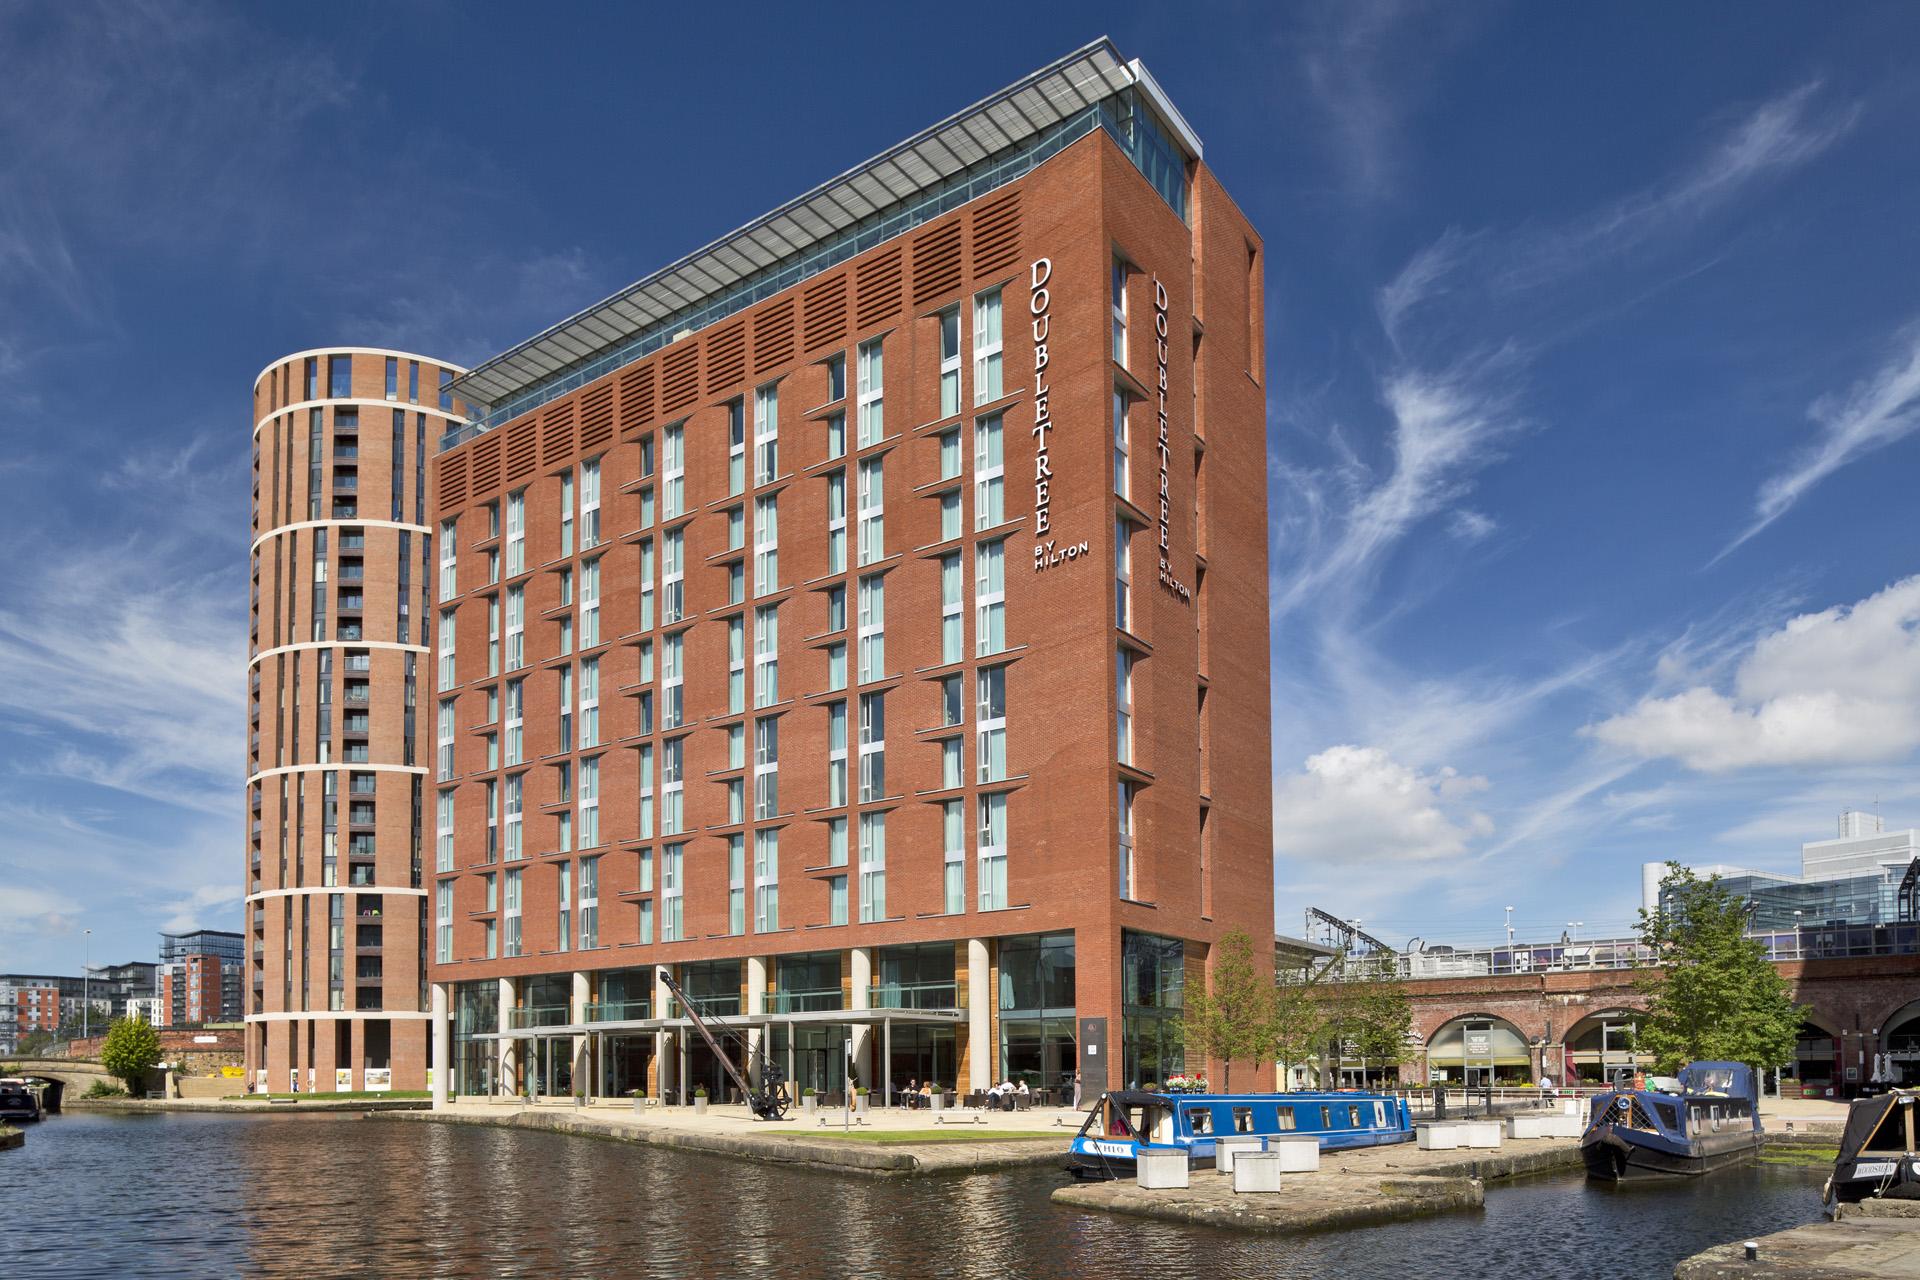 DoubleTree by Hilton Hotel Leeds City Centre - Clo